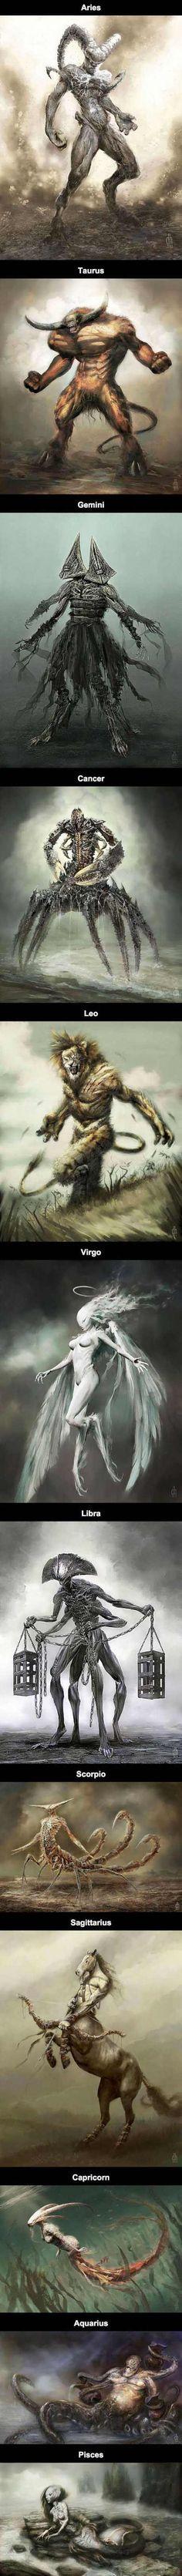 Zodiac signs reimagined - Imgur